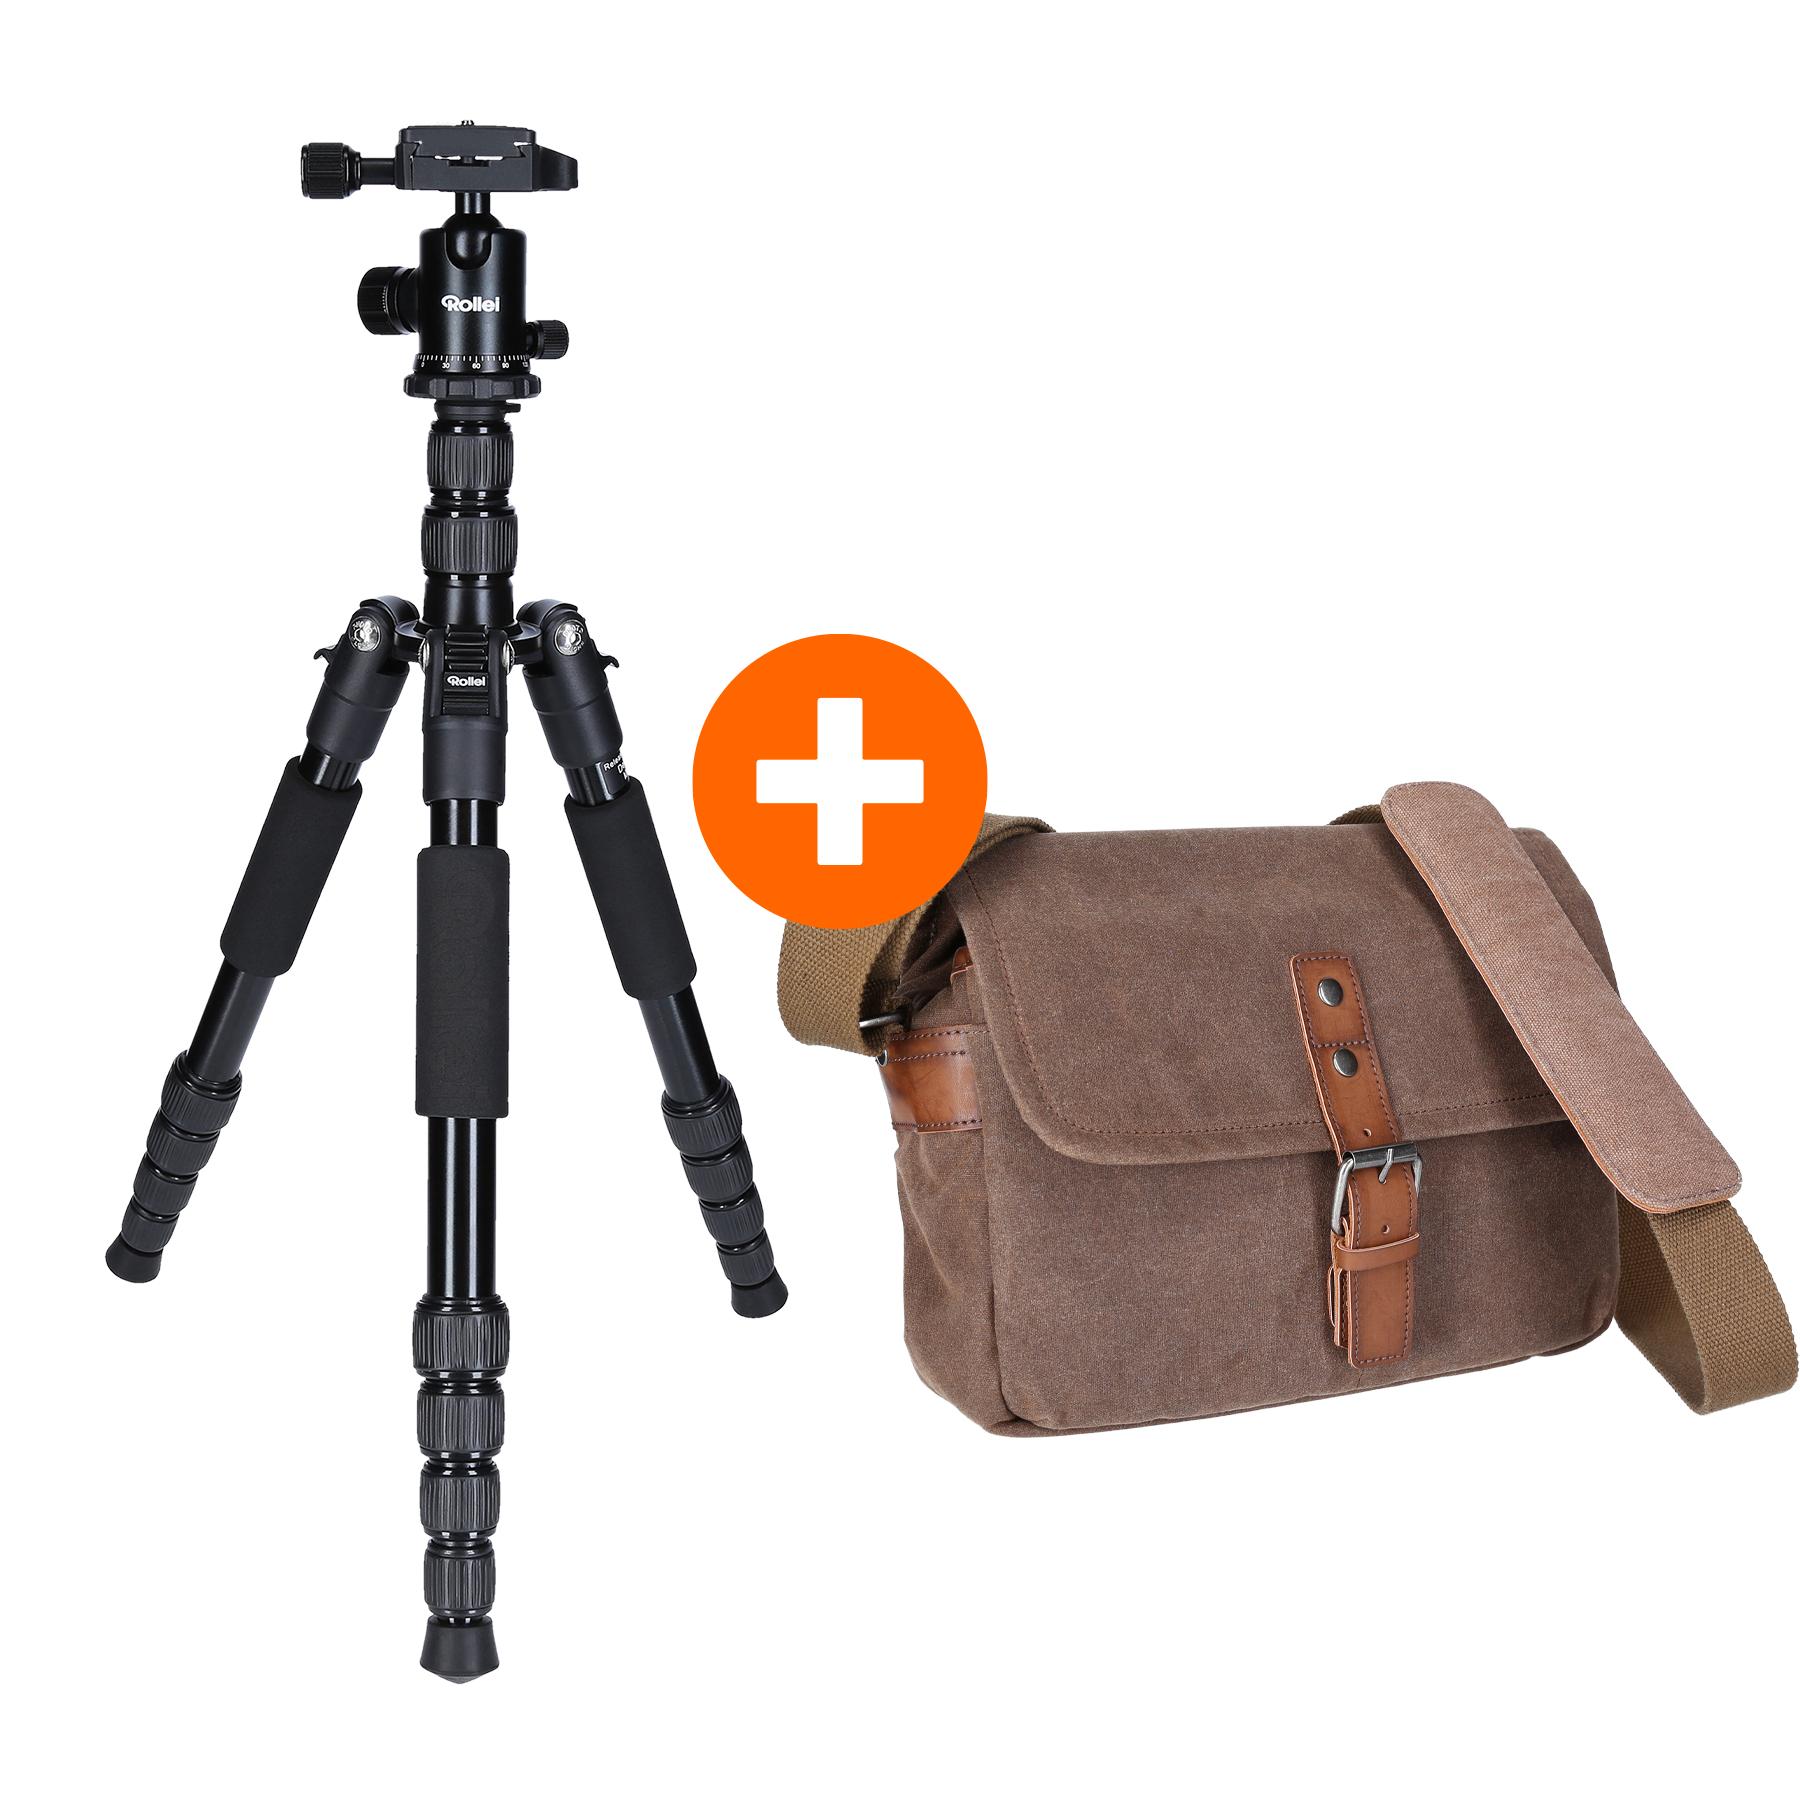 Rollei Fotostativ Traveler Aluminium Black + Messenger Bag